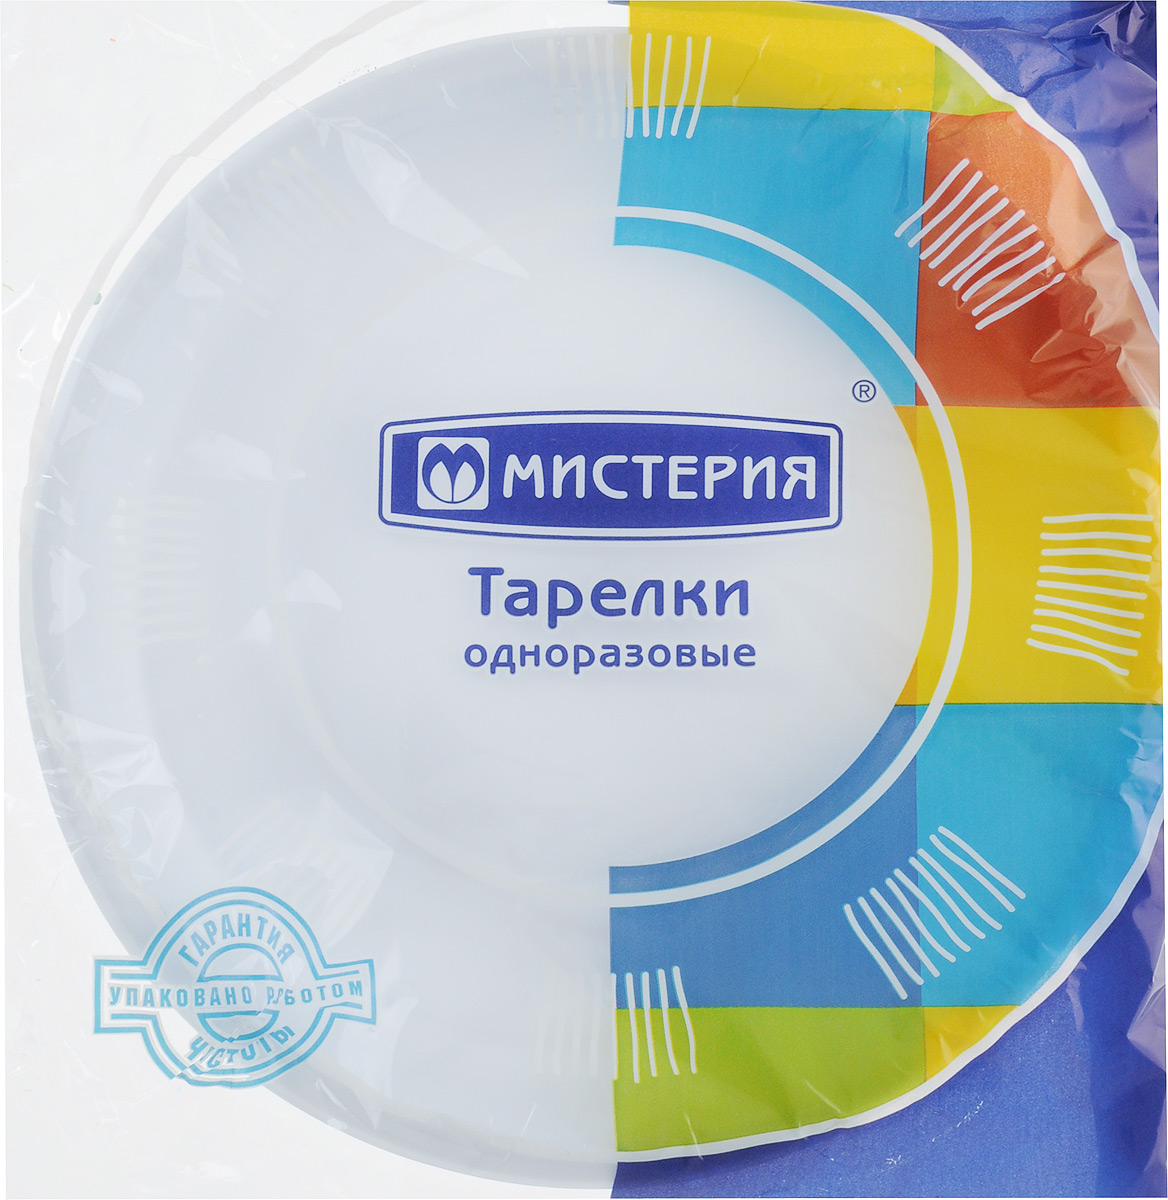 Набор одноразовых тарелок Мистерия, диаметр 20,5 см, 12 шт